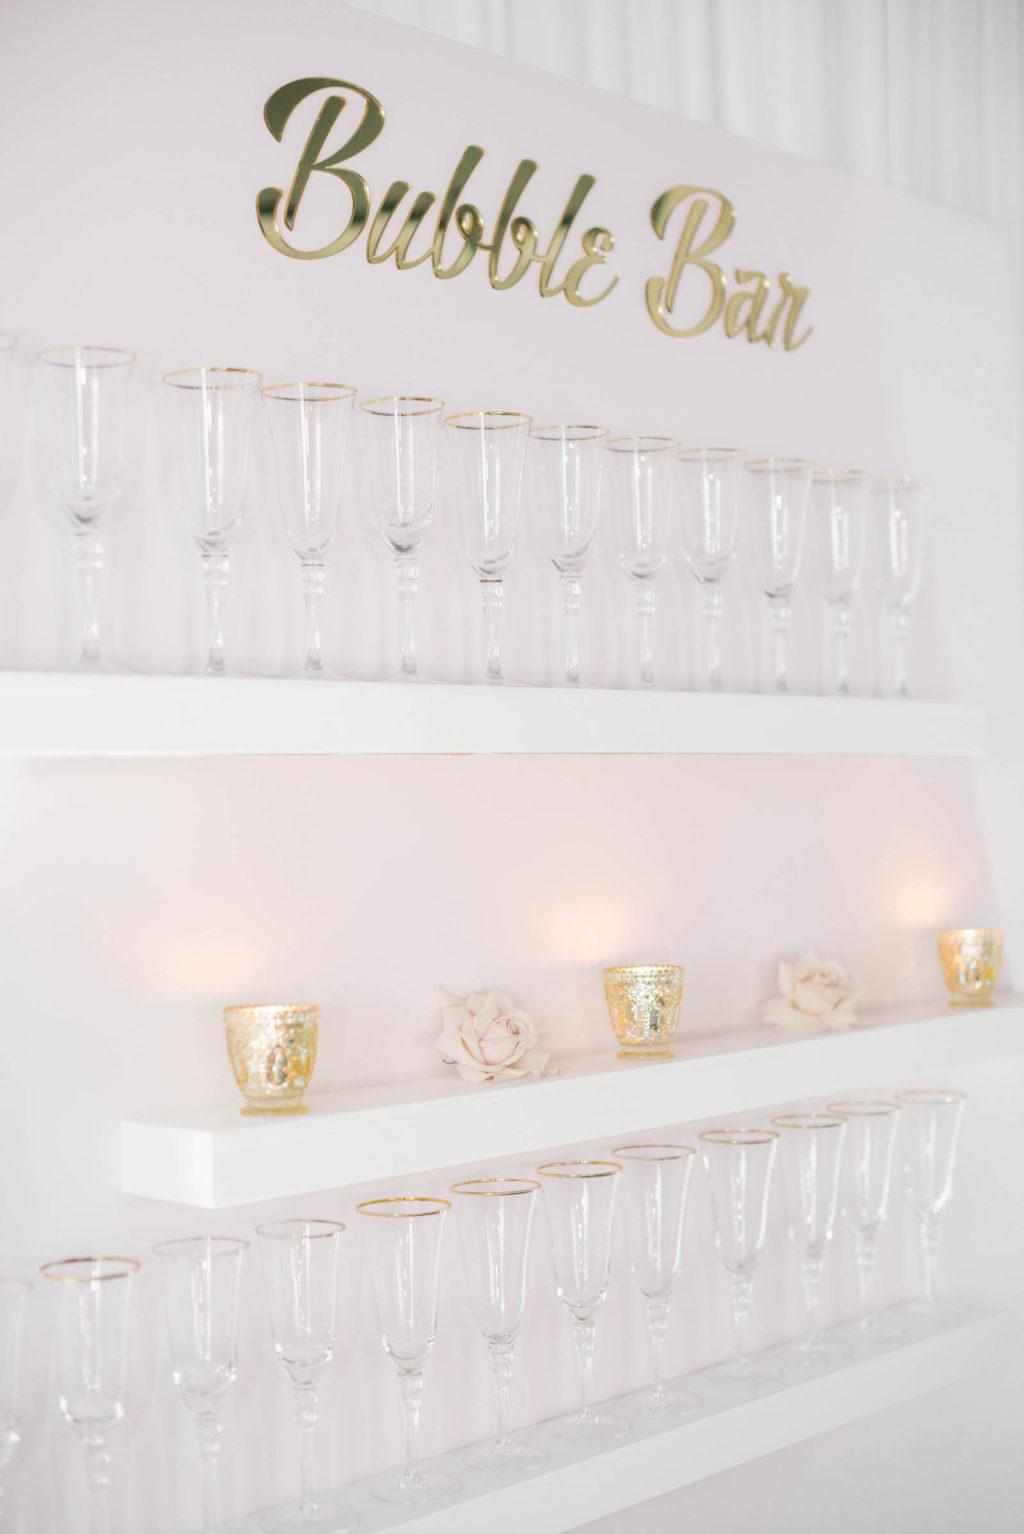 Clearwater Beach Wedding Venue Bellwether Beach Resort Styled With Love Something Bleu by McKenna Bleu | Instagram Wedding Designer Inspiration | Bubble Bar Champagne Wall Shelf Display